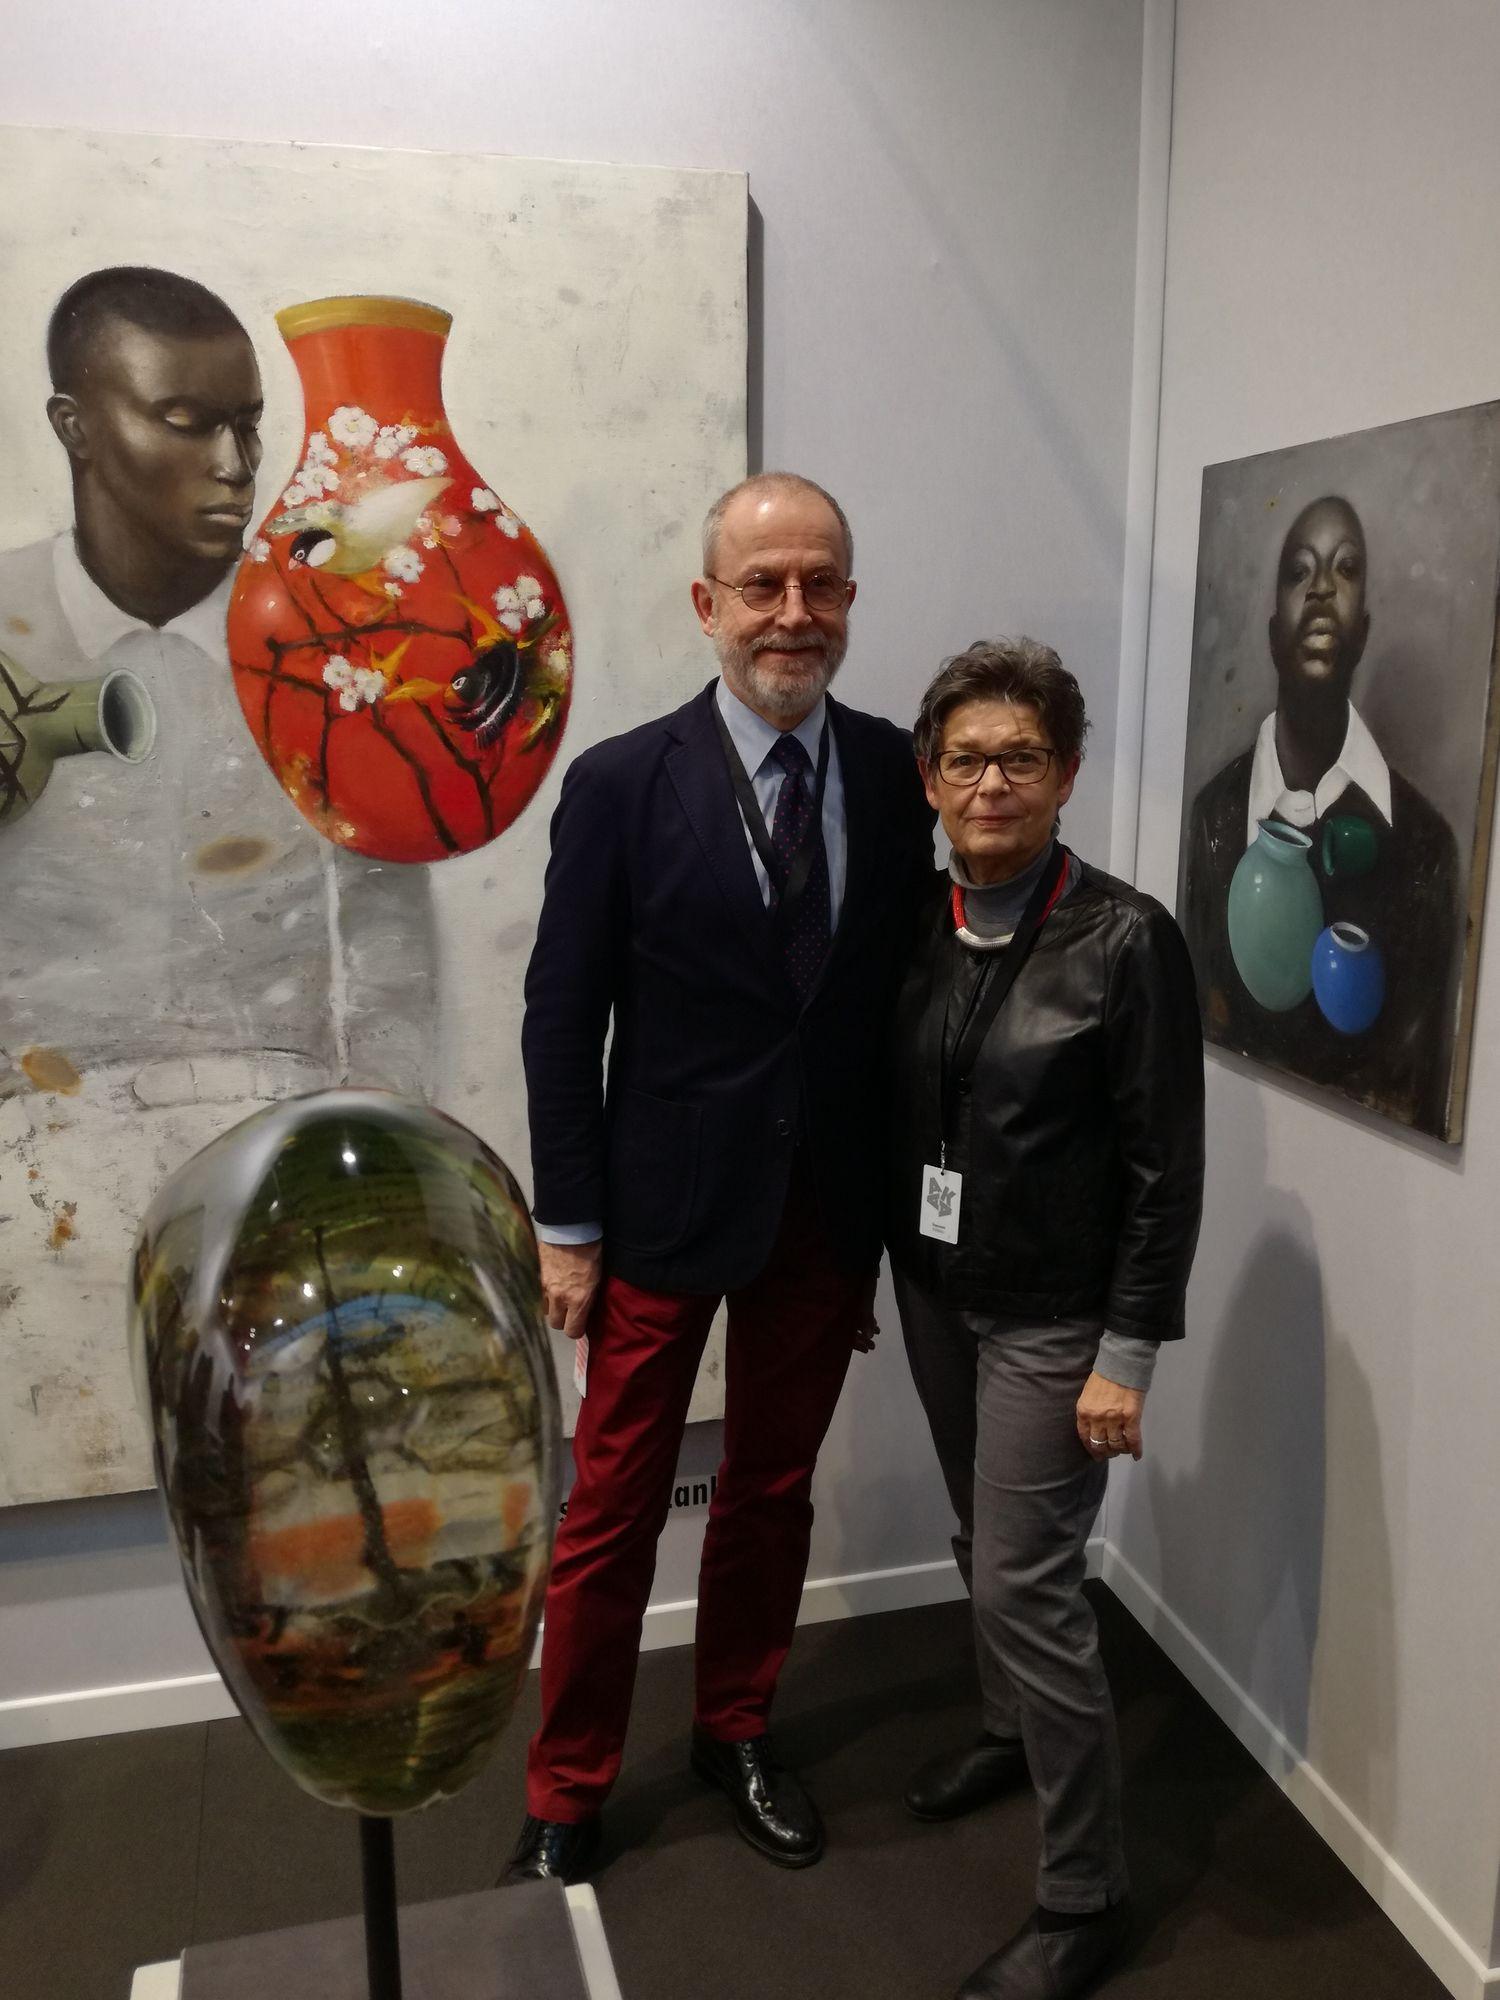 AKAA - Art & Design fair, Paris 10 - 12 November 2017,  Jutta & Joachim Melchers ARTCO GALLERY